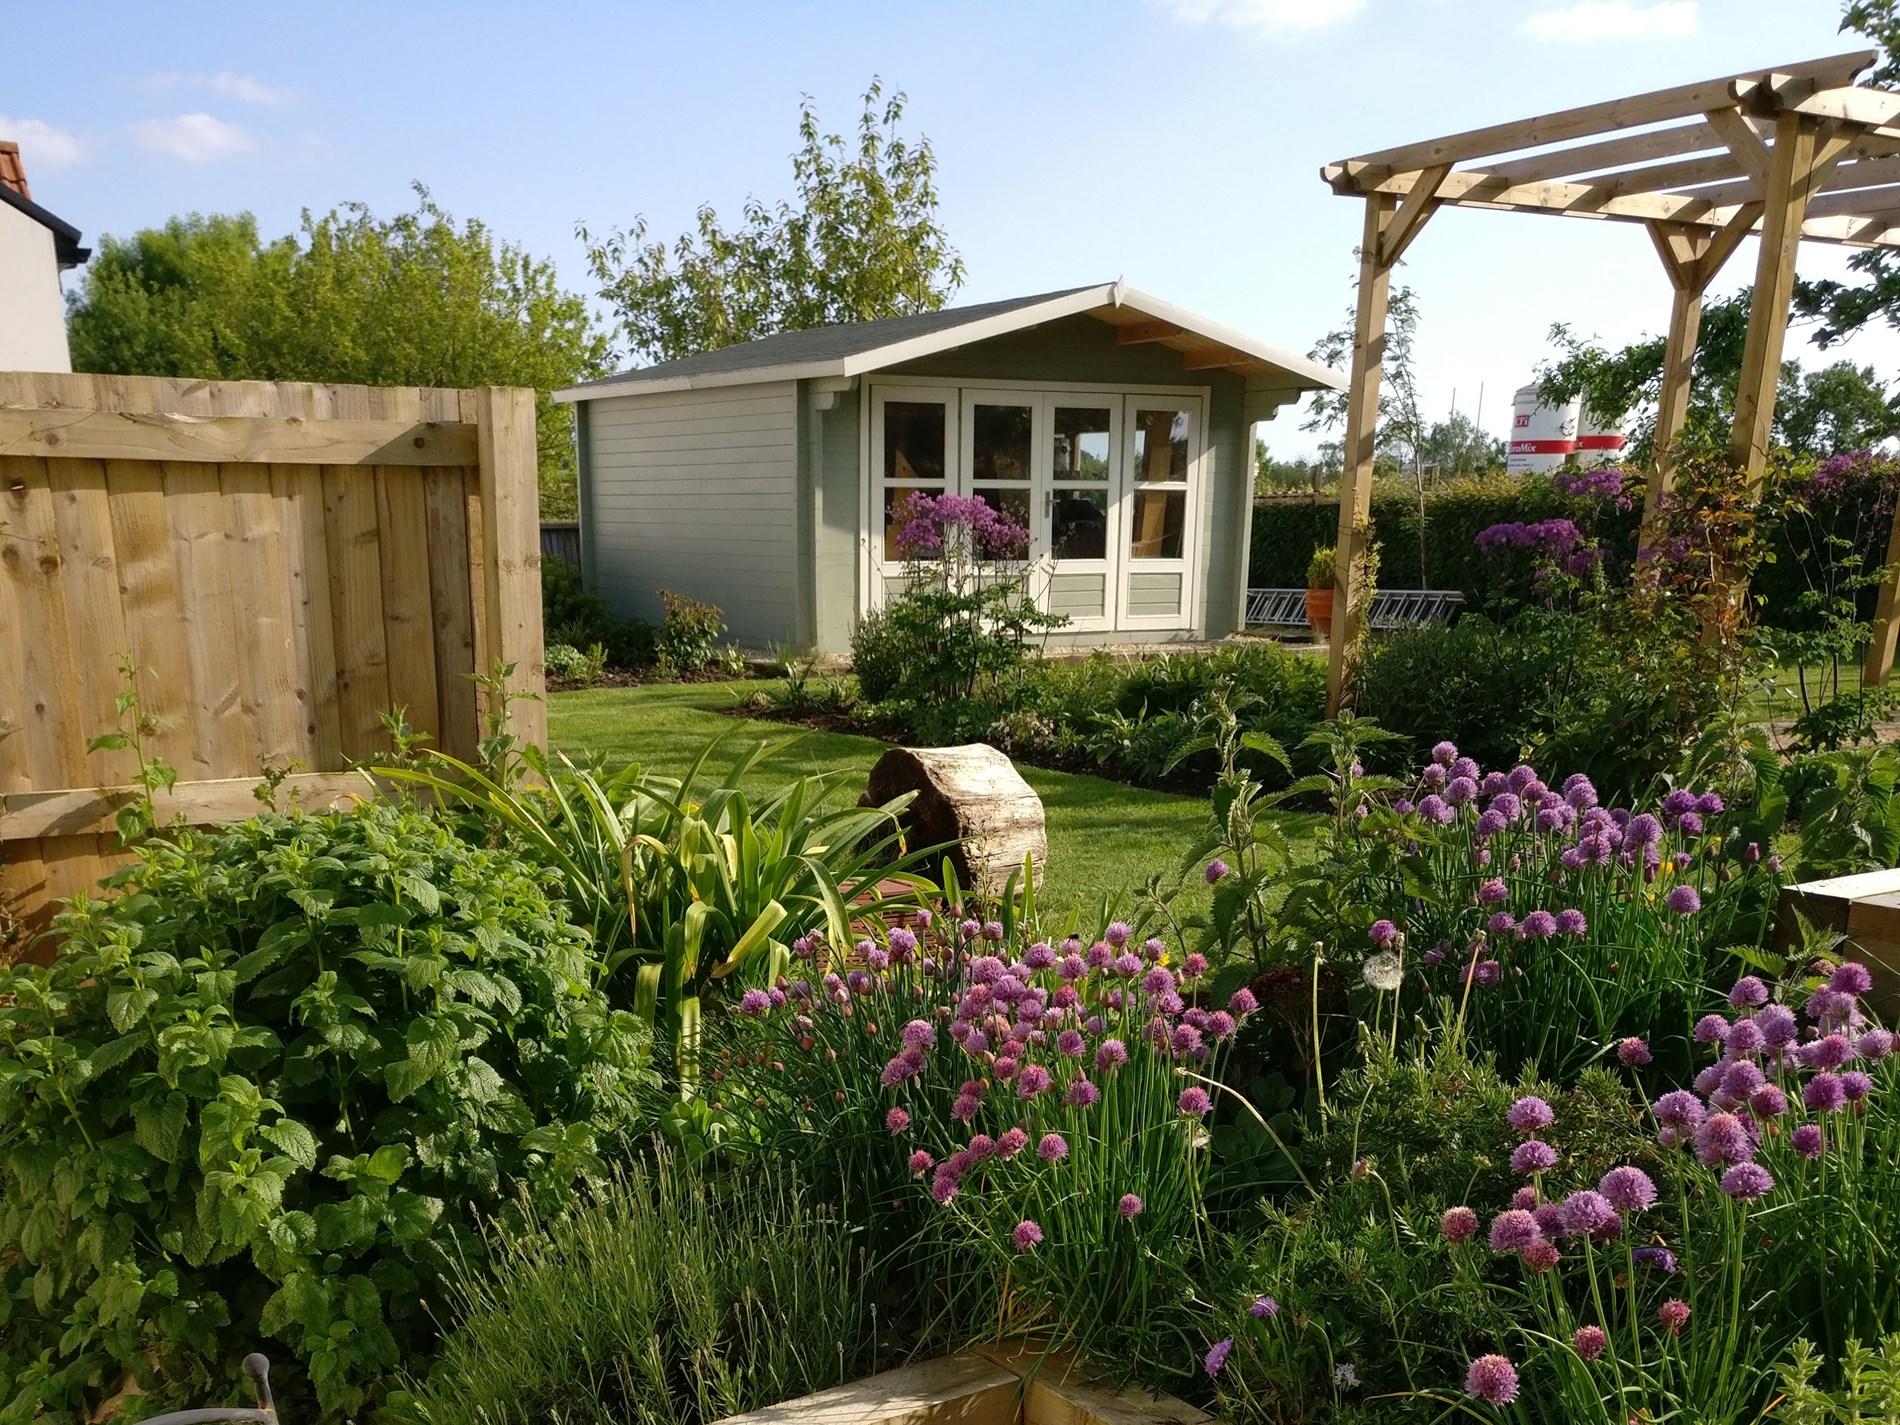 2 Bedroom Cottage in Wedmore, Dorset and Somerset